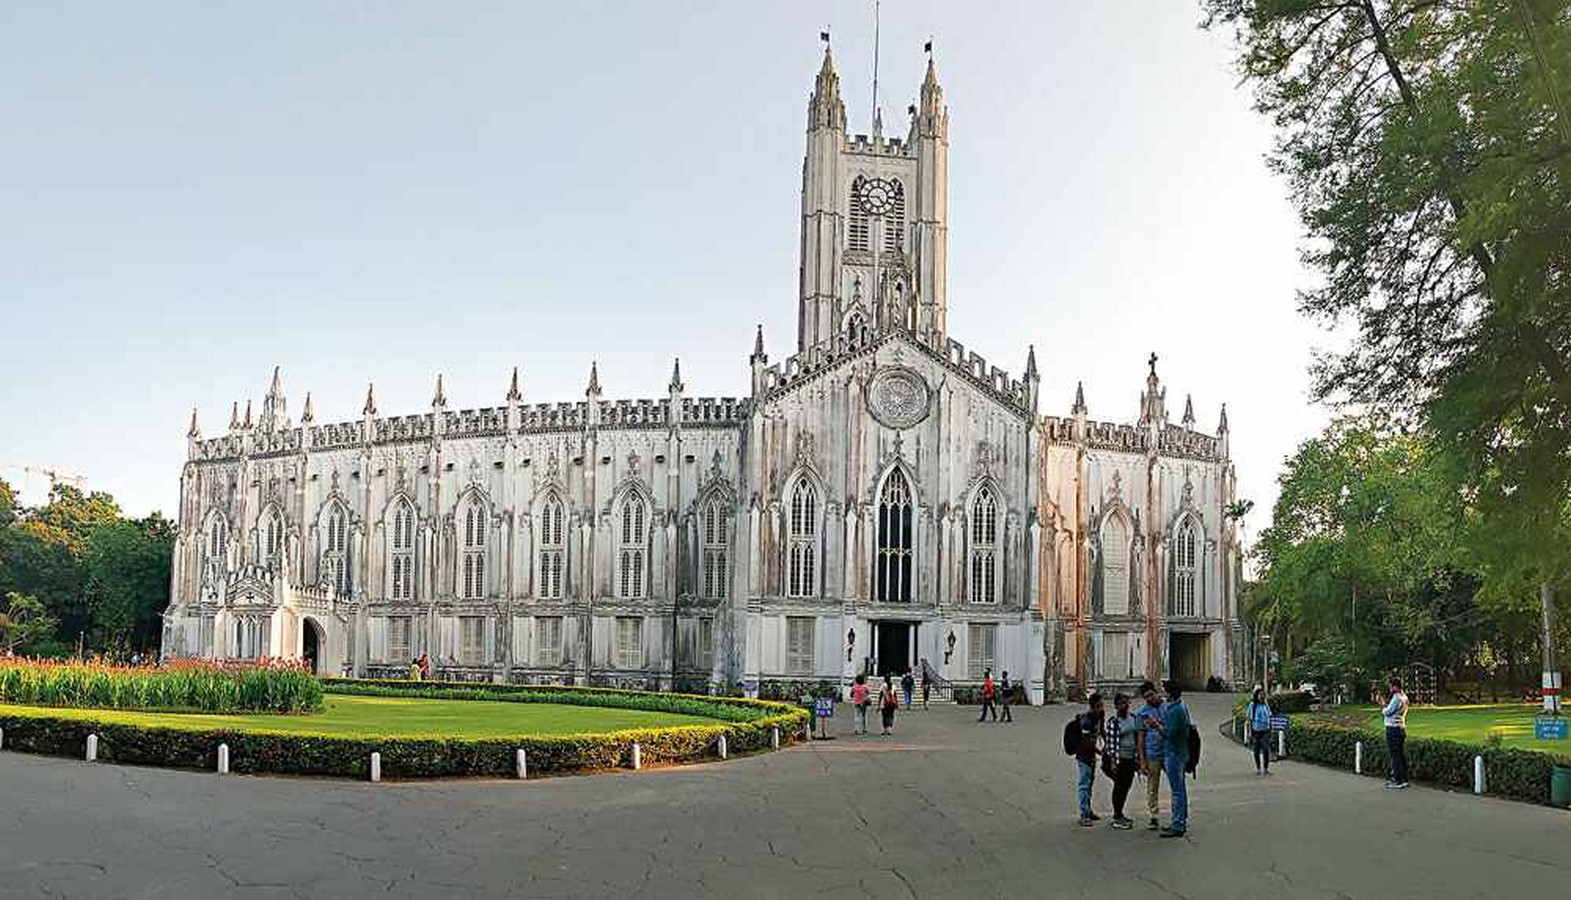 Heritage architecture - Kolkata - Sheet1